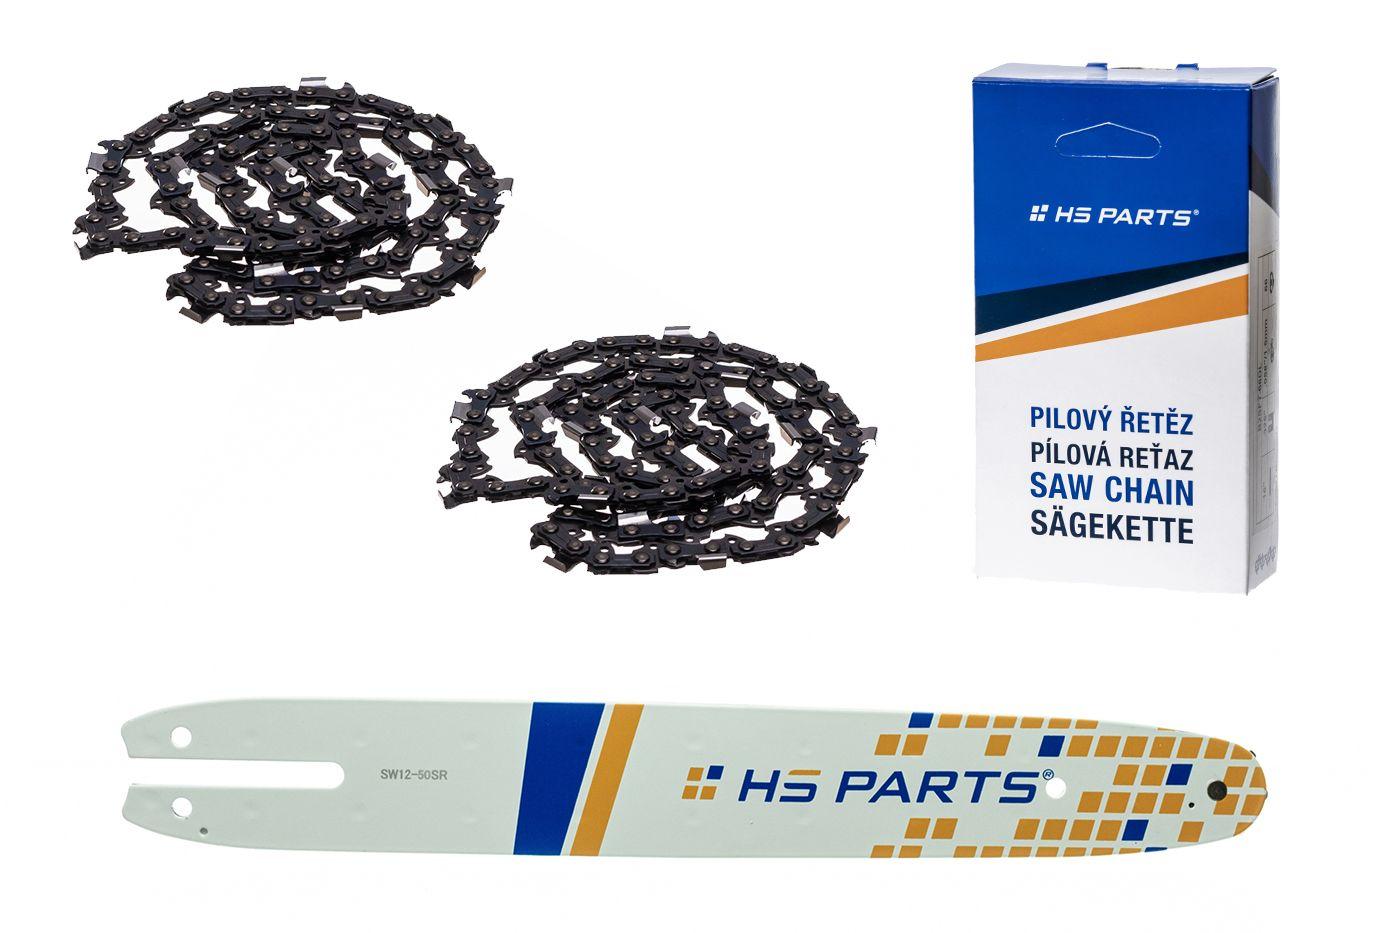 "HS PARTS Akciový set vodiaca líšta 12"" (30 cm) 3/8"" .050"" (1,3 mm) + 2x pílový reťaz 44čl."